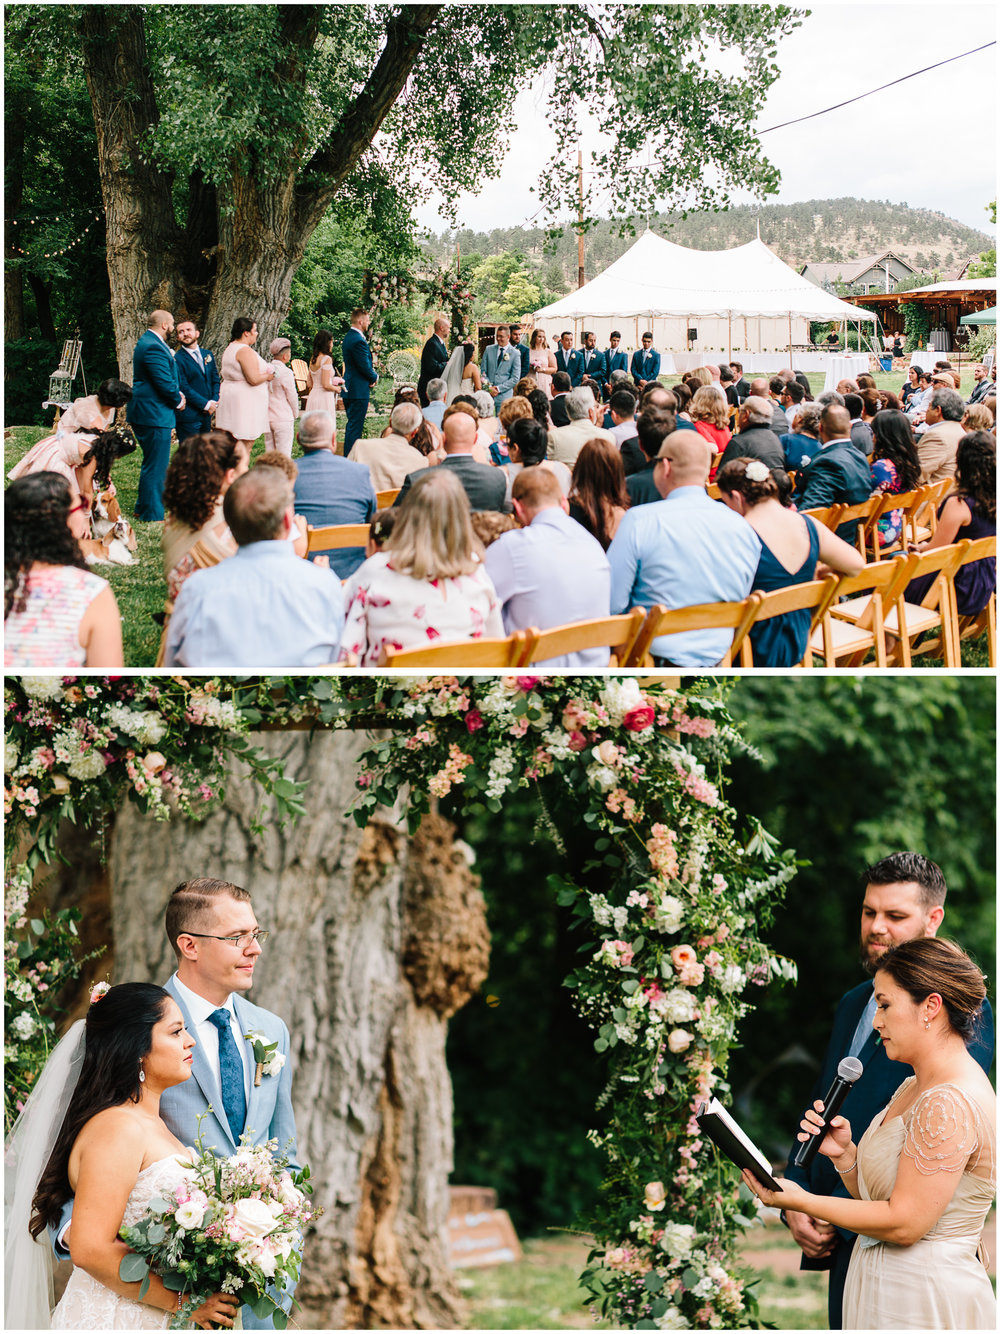 lyons_farmette_wedding_25.jpg